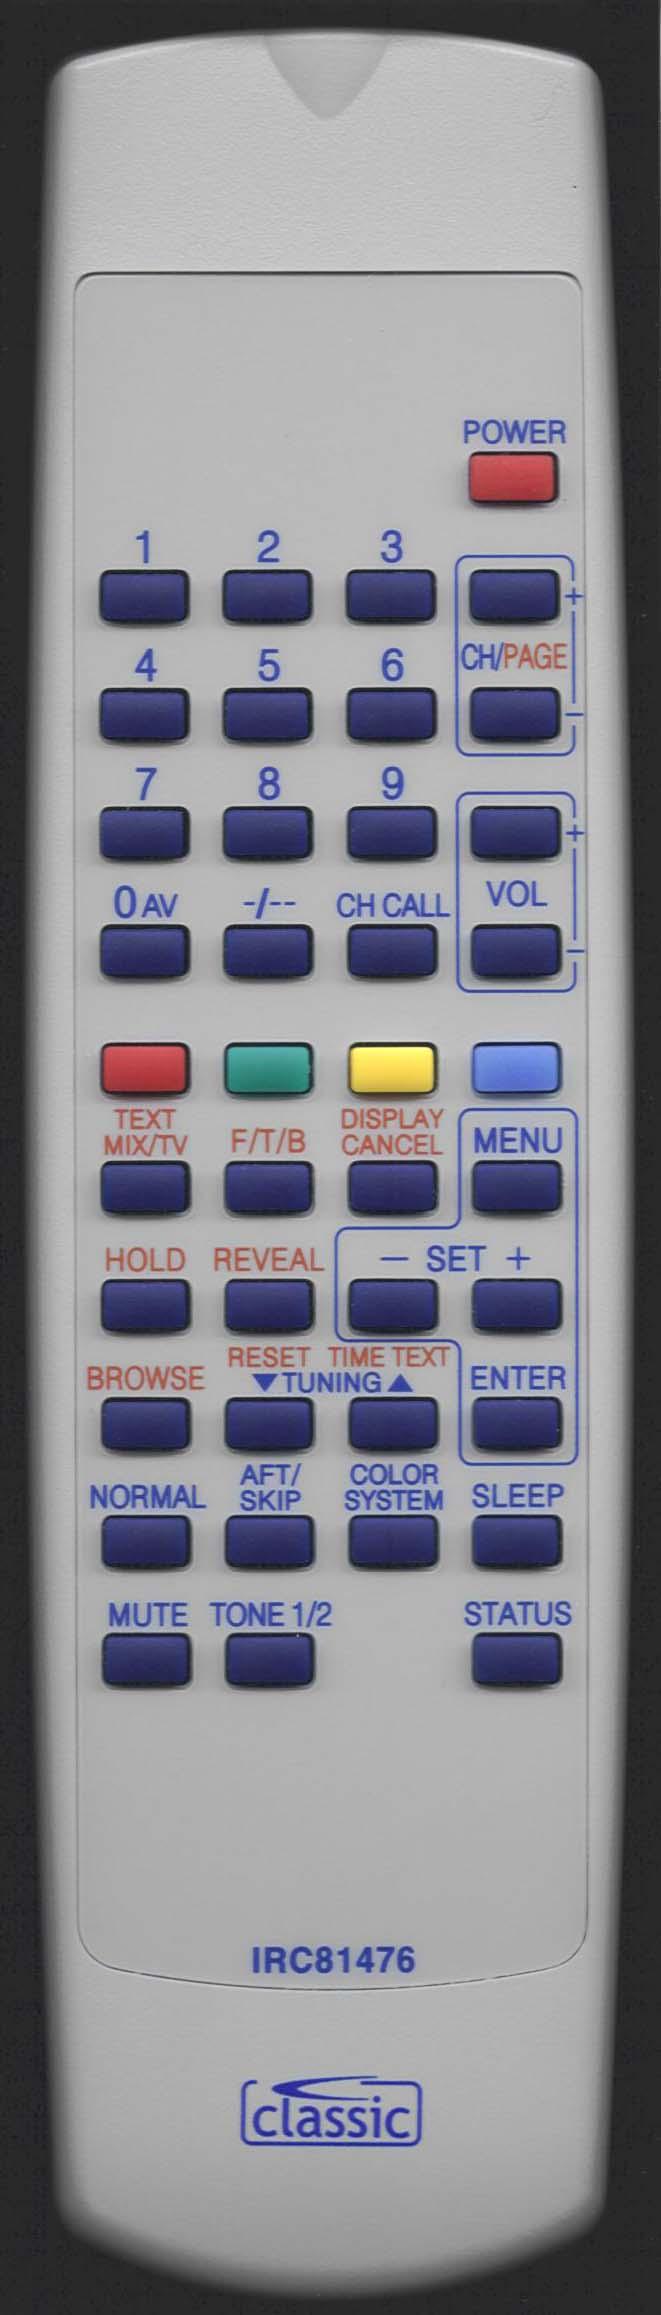 MATSUI 07660BQ020 Remote Control Alternative